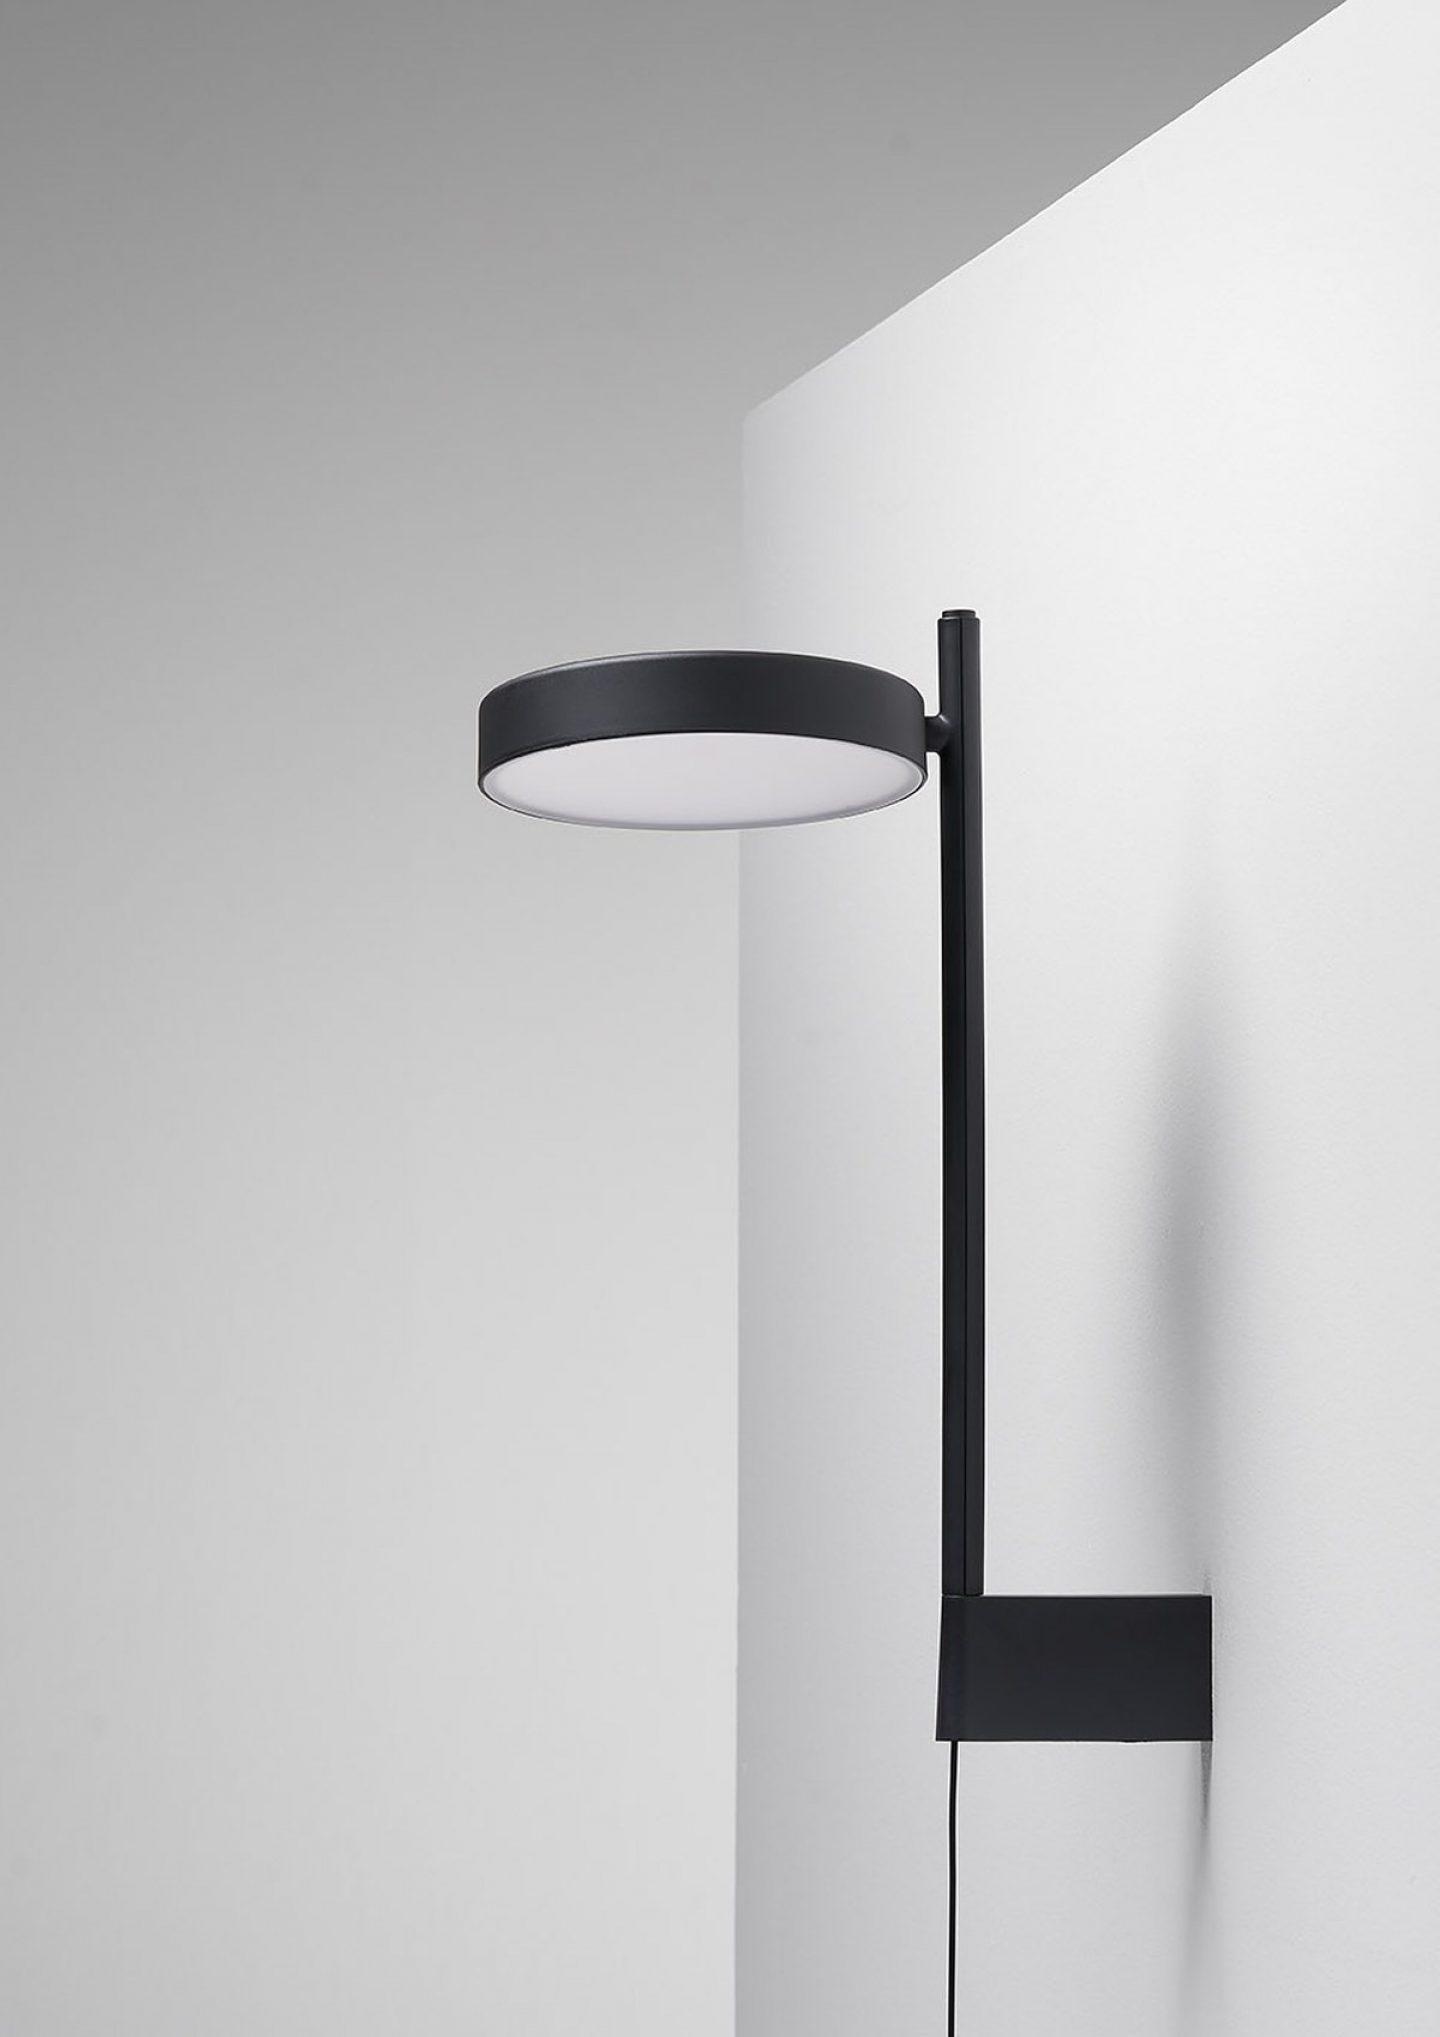 IGNANT-Design-Wastberg-w182-Pastille-06